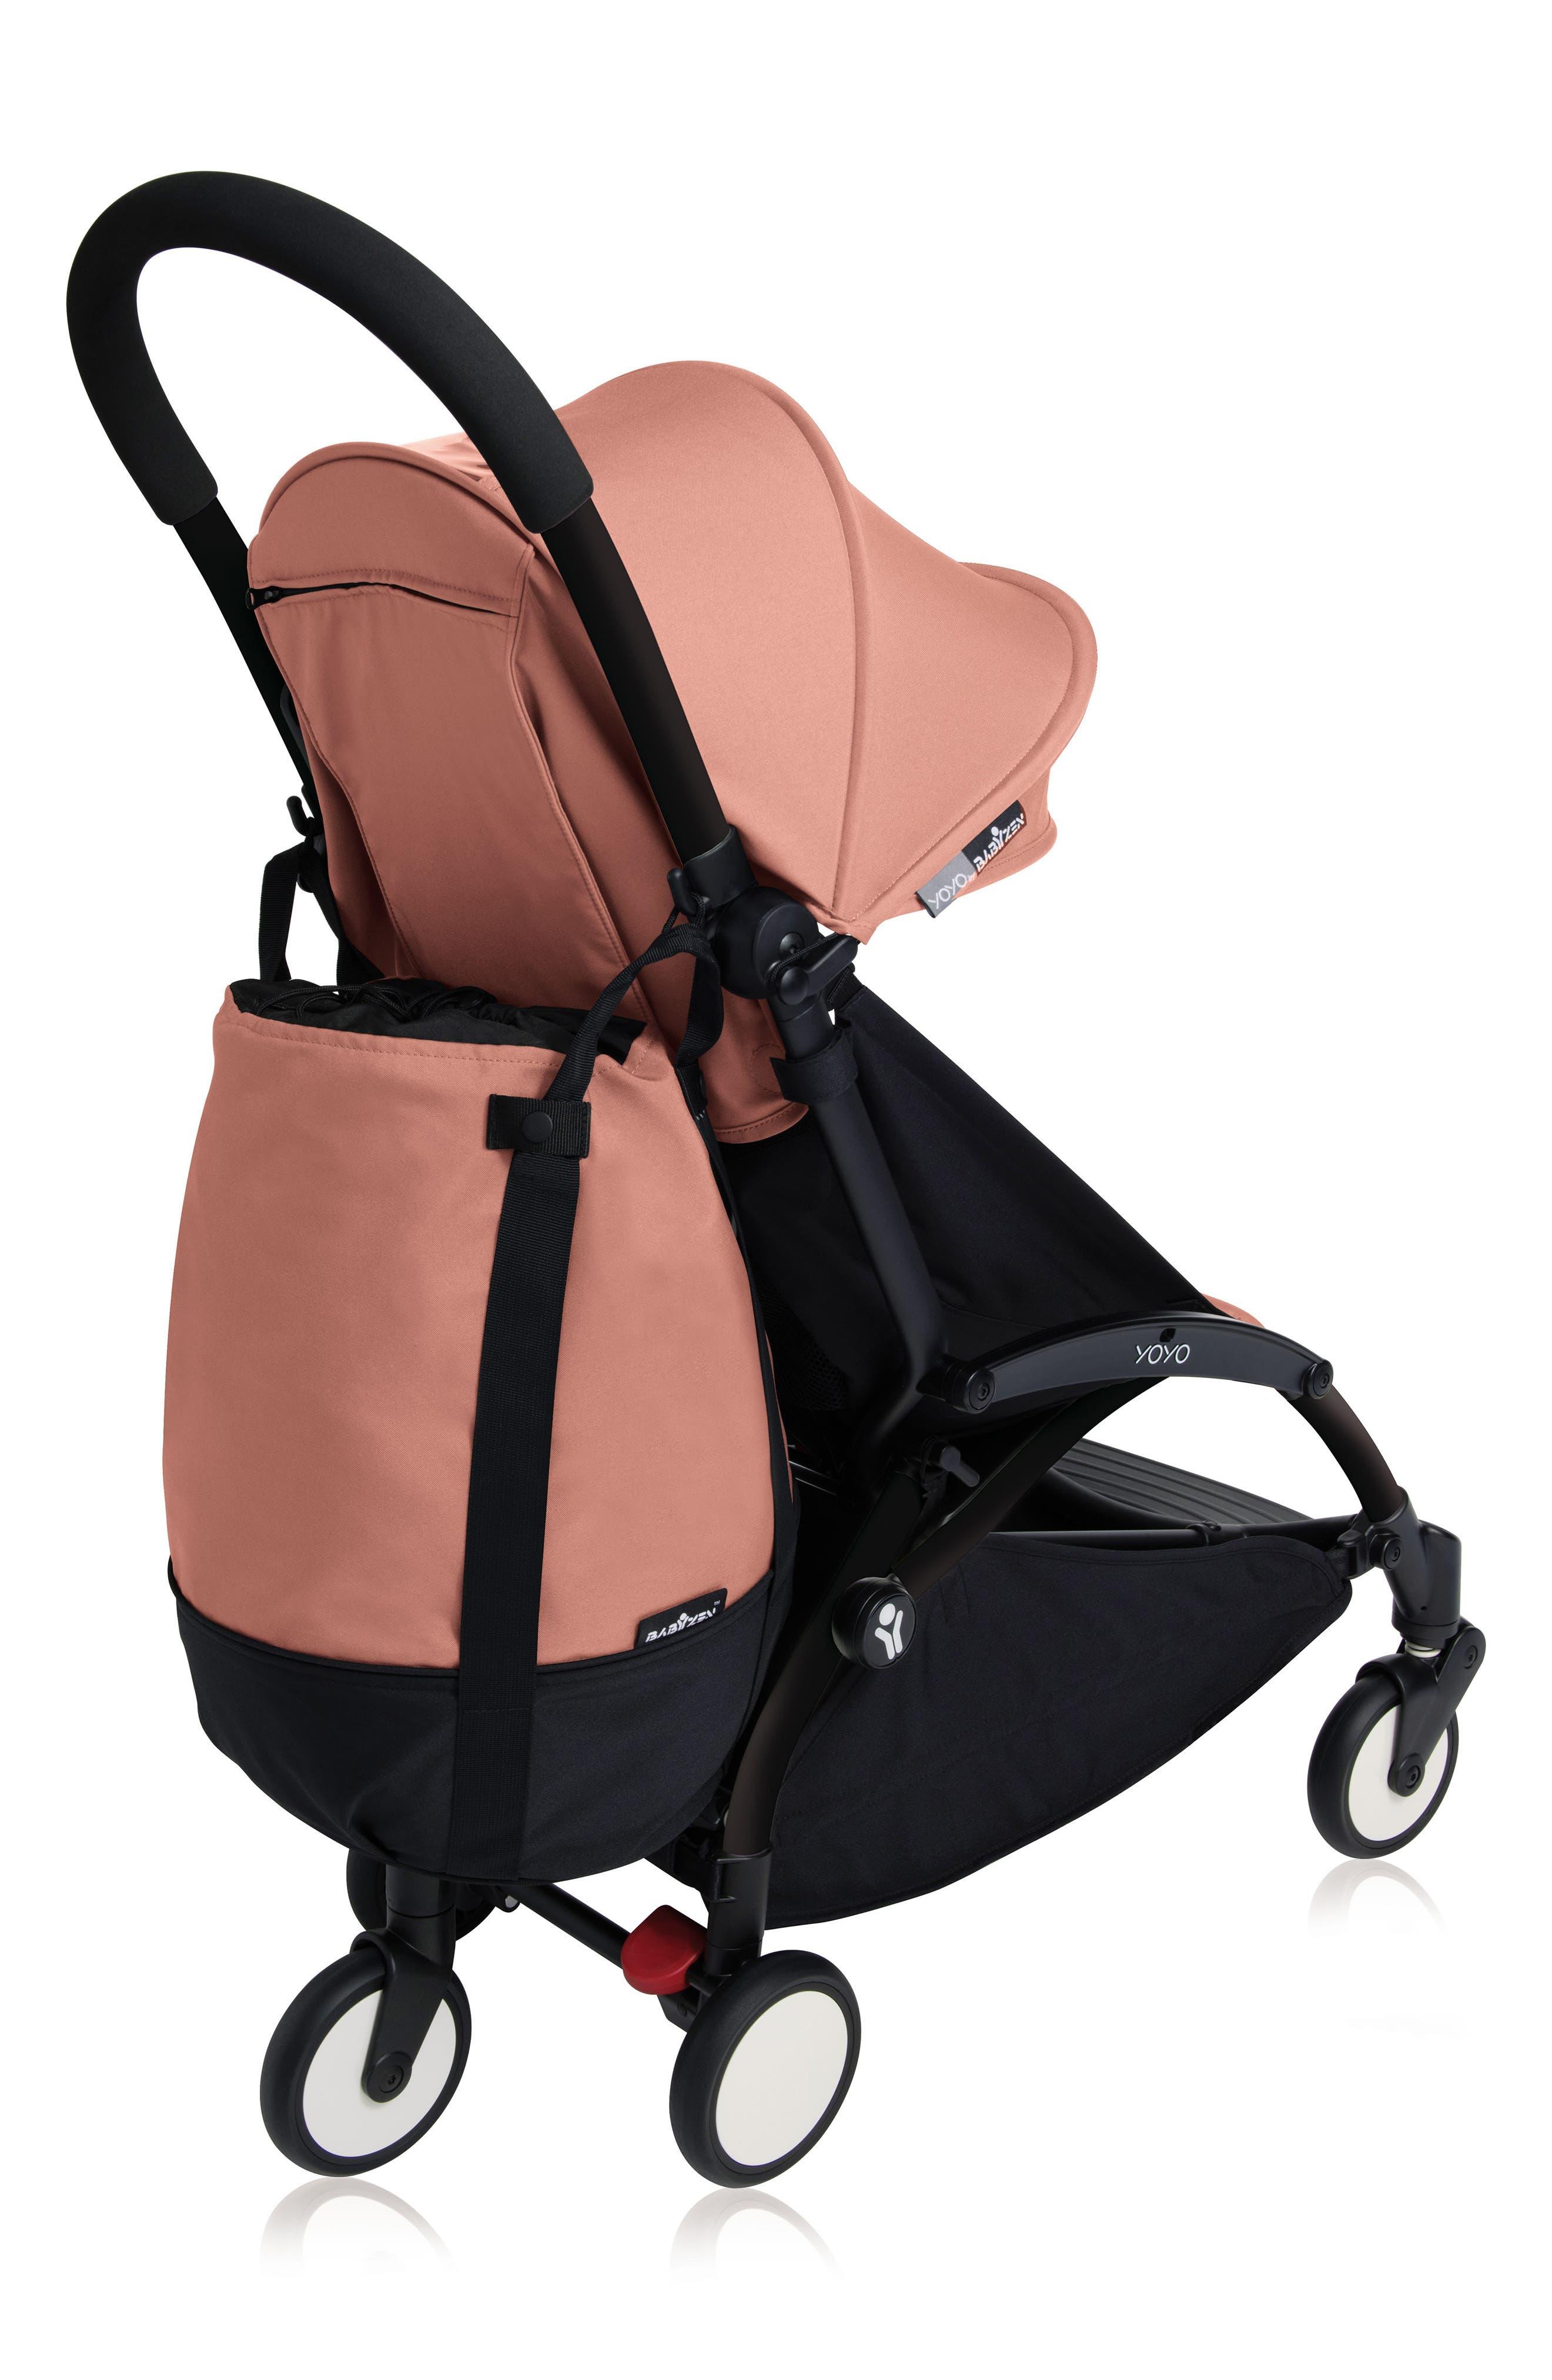 Infant Babyzen(TM) Yoyo Rolling Stroller Bag Size One Size  Pink